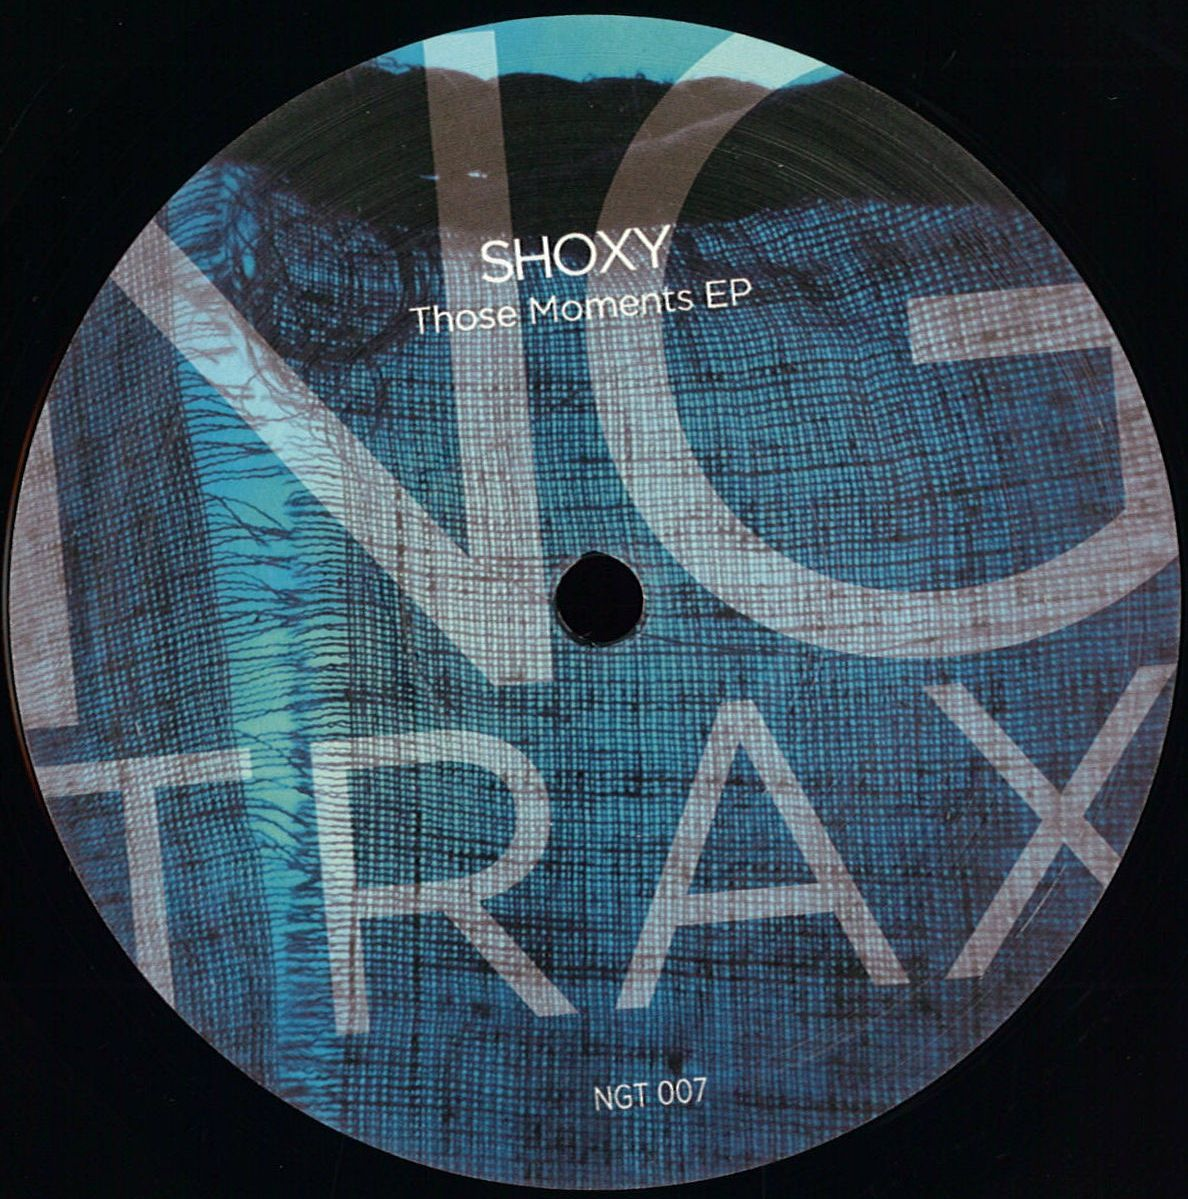 5332a57901d Shoxy - Those Moments Ep   NG Trax NGT007 - Vinyl